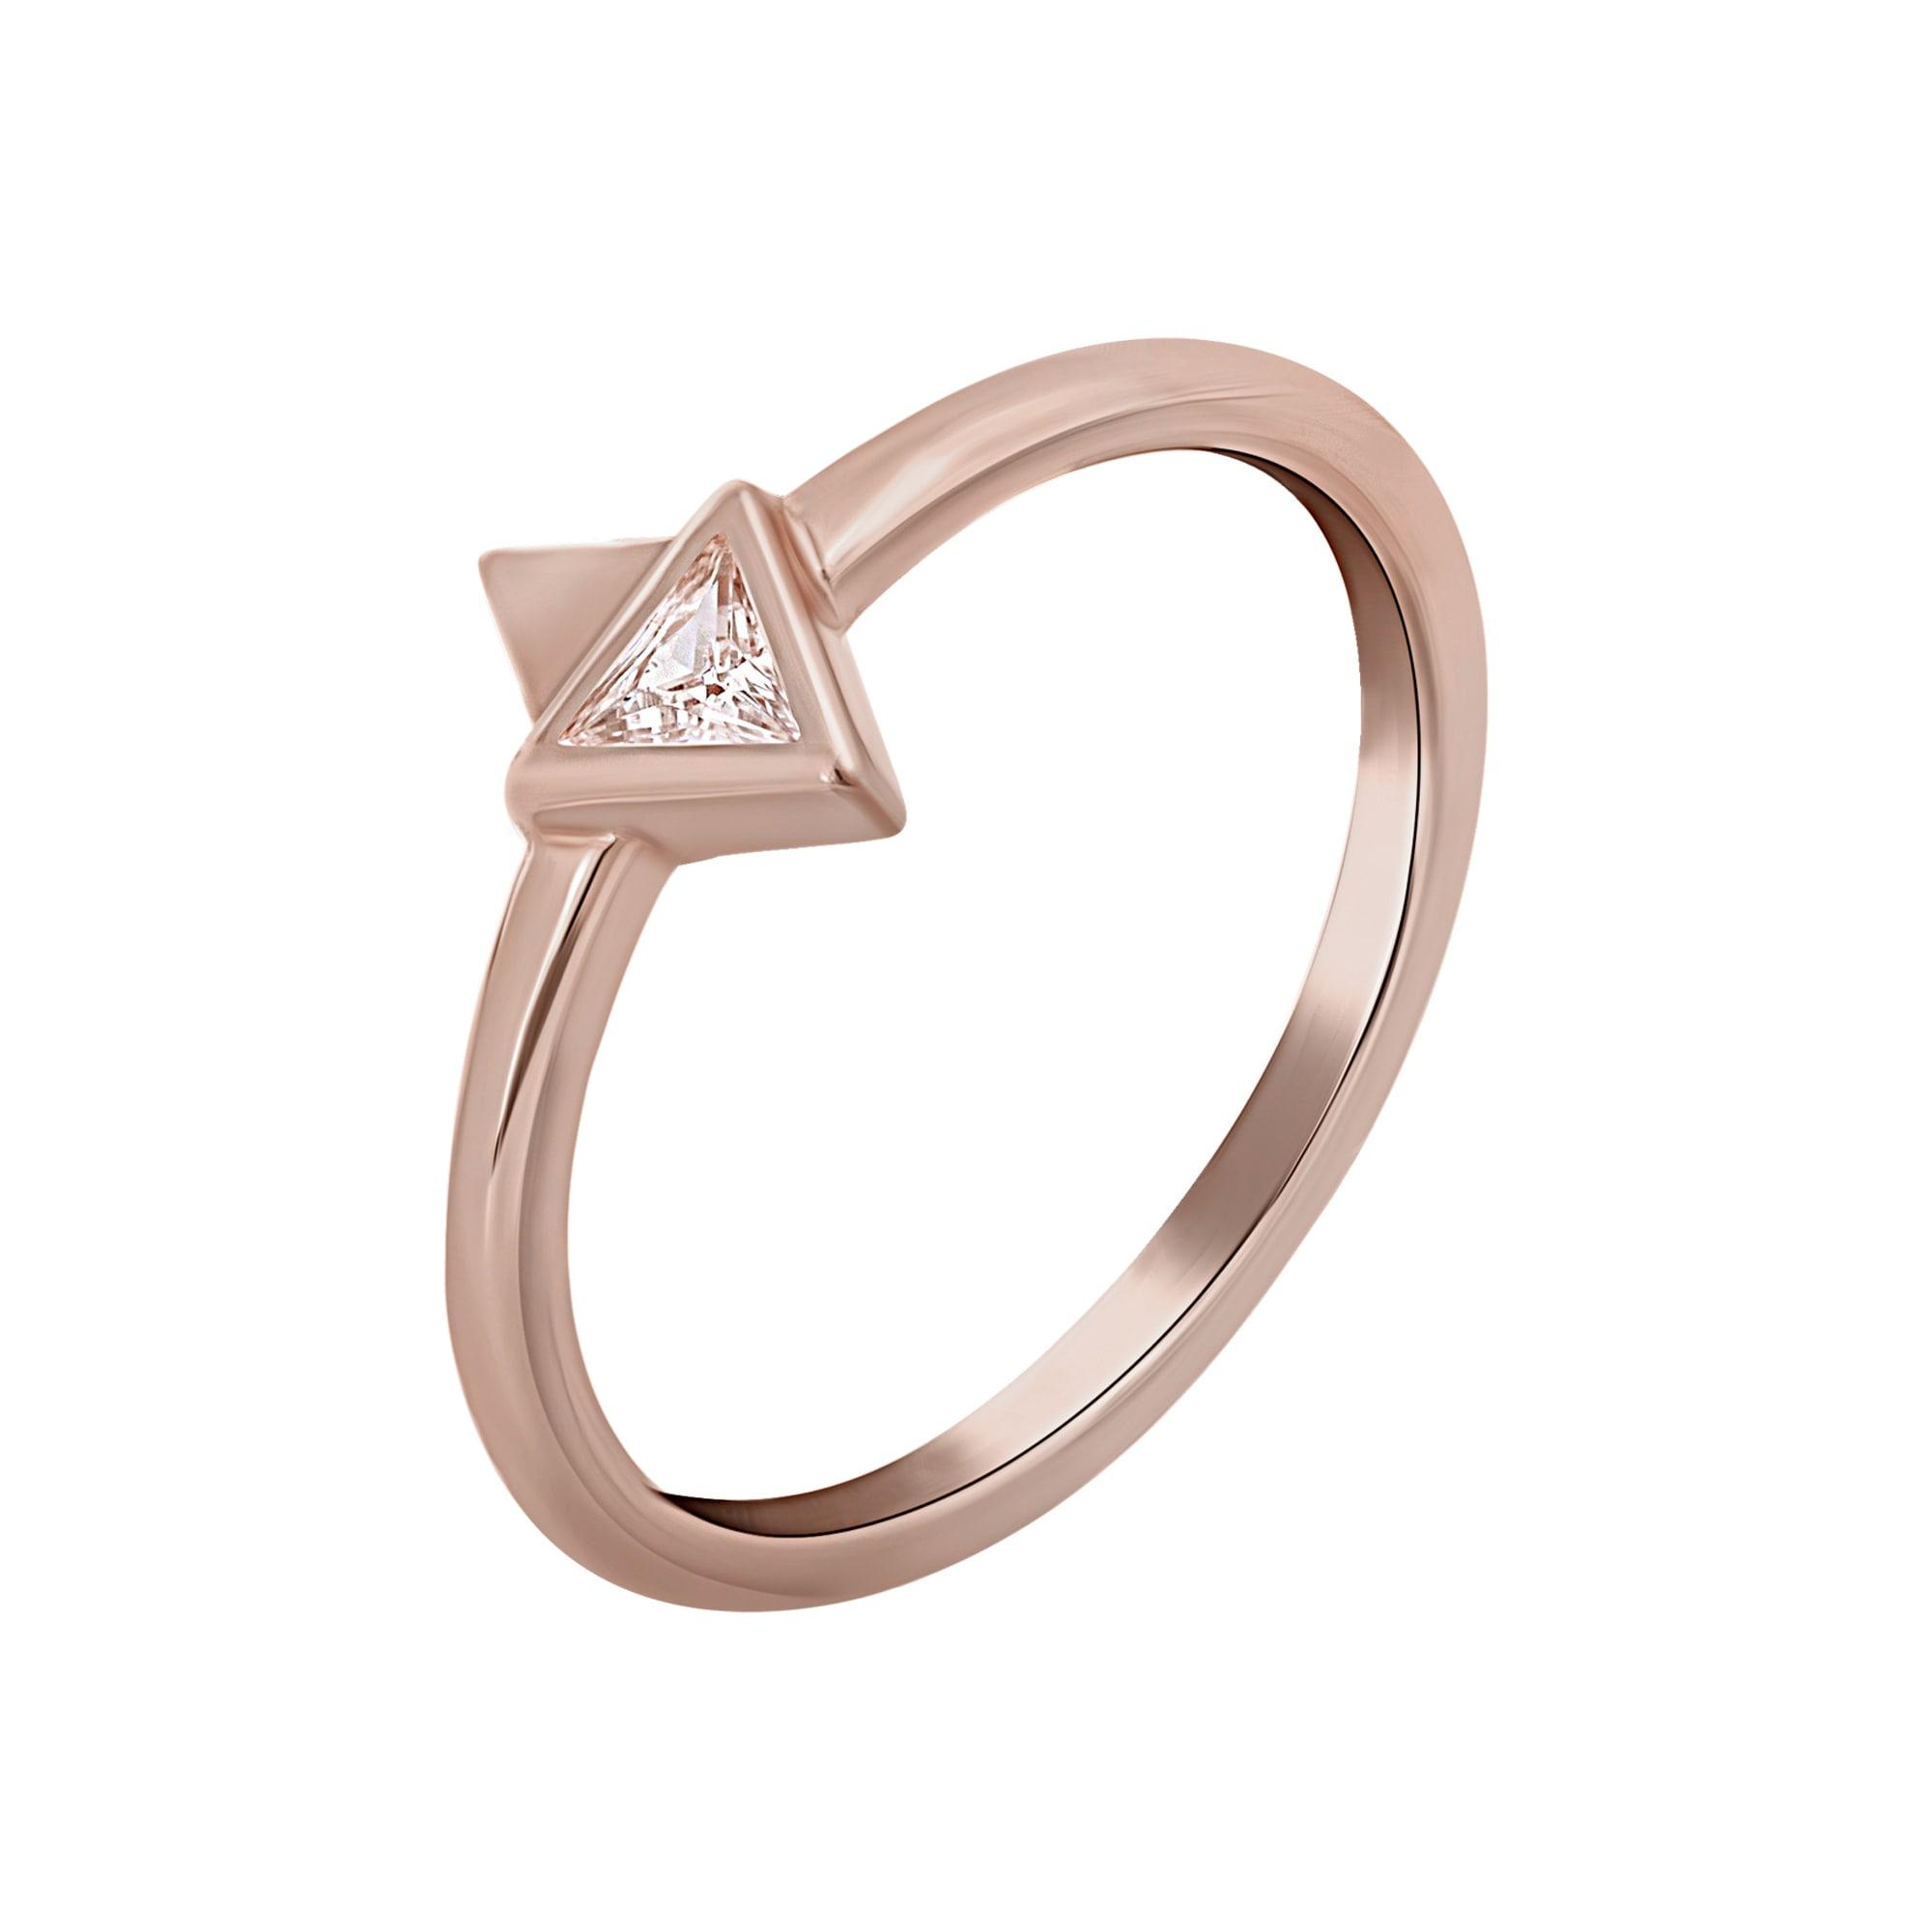 caï - CAÏ Silberring 925 Silber rosévergoldet mit Zirkonia Dreieck, Glänzend